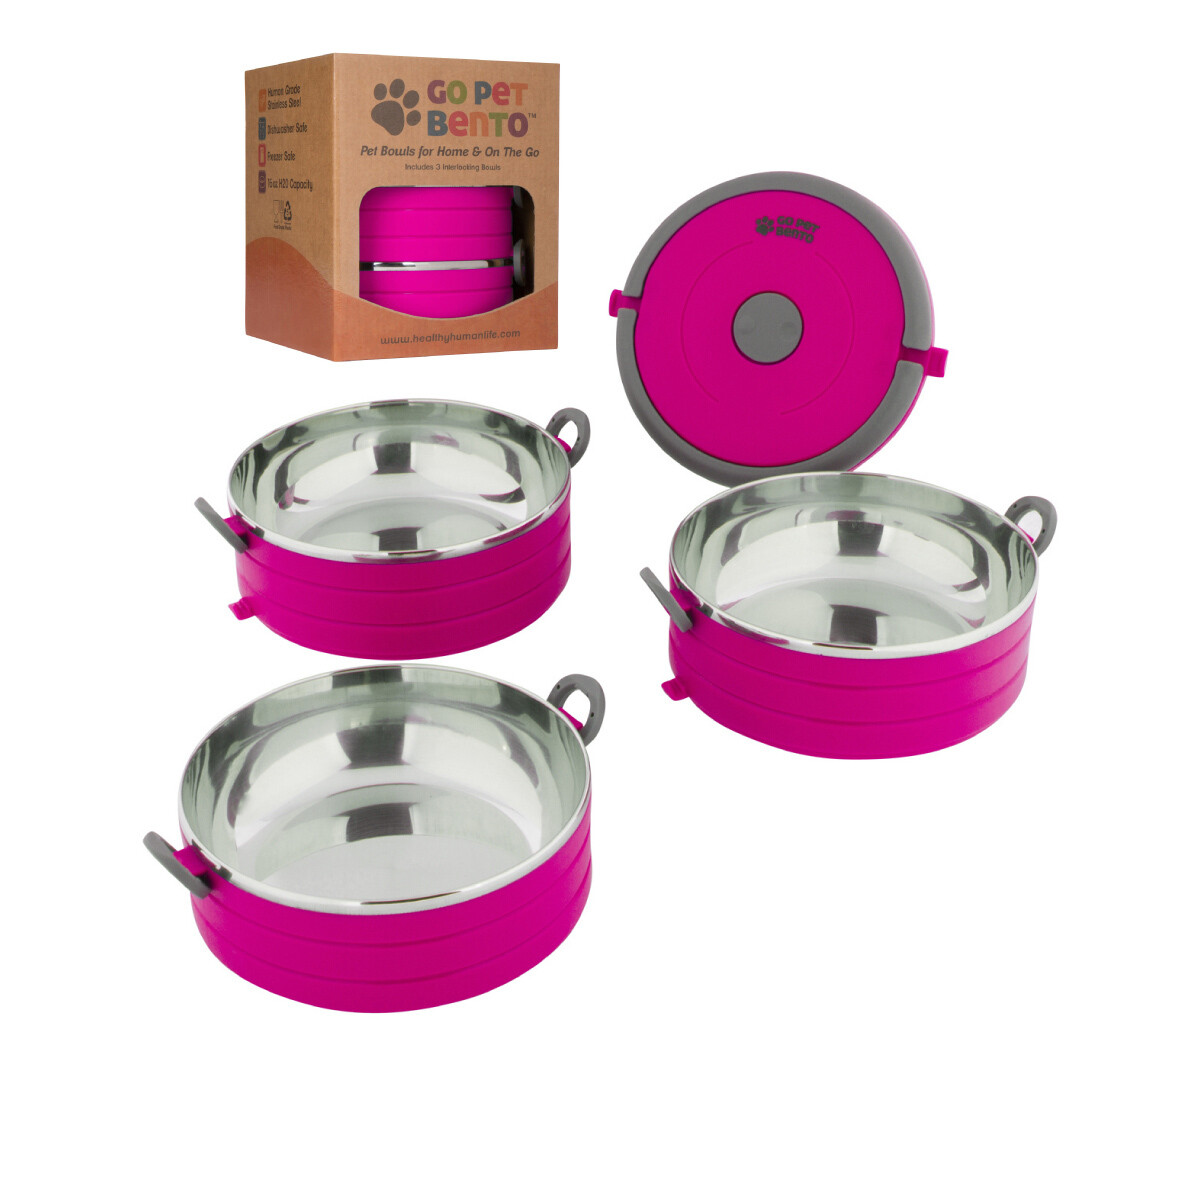 Travel Pet Bento 3 Bowls Pink